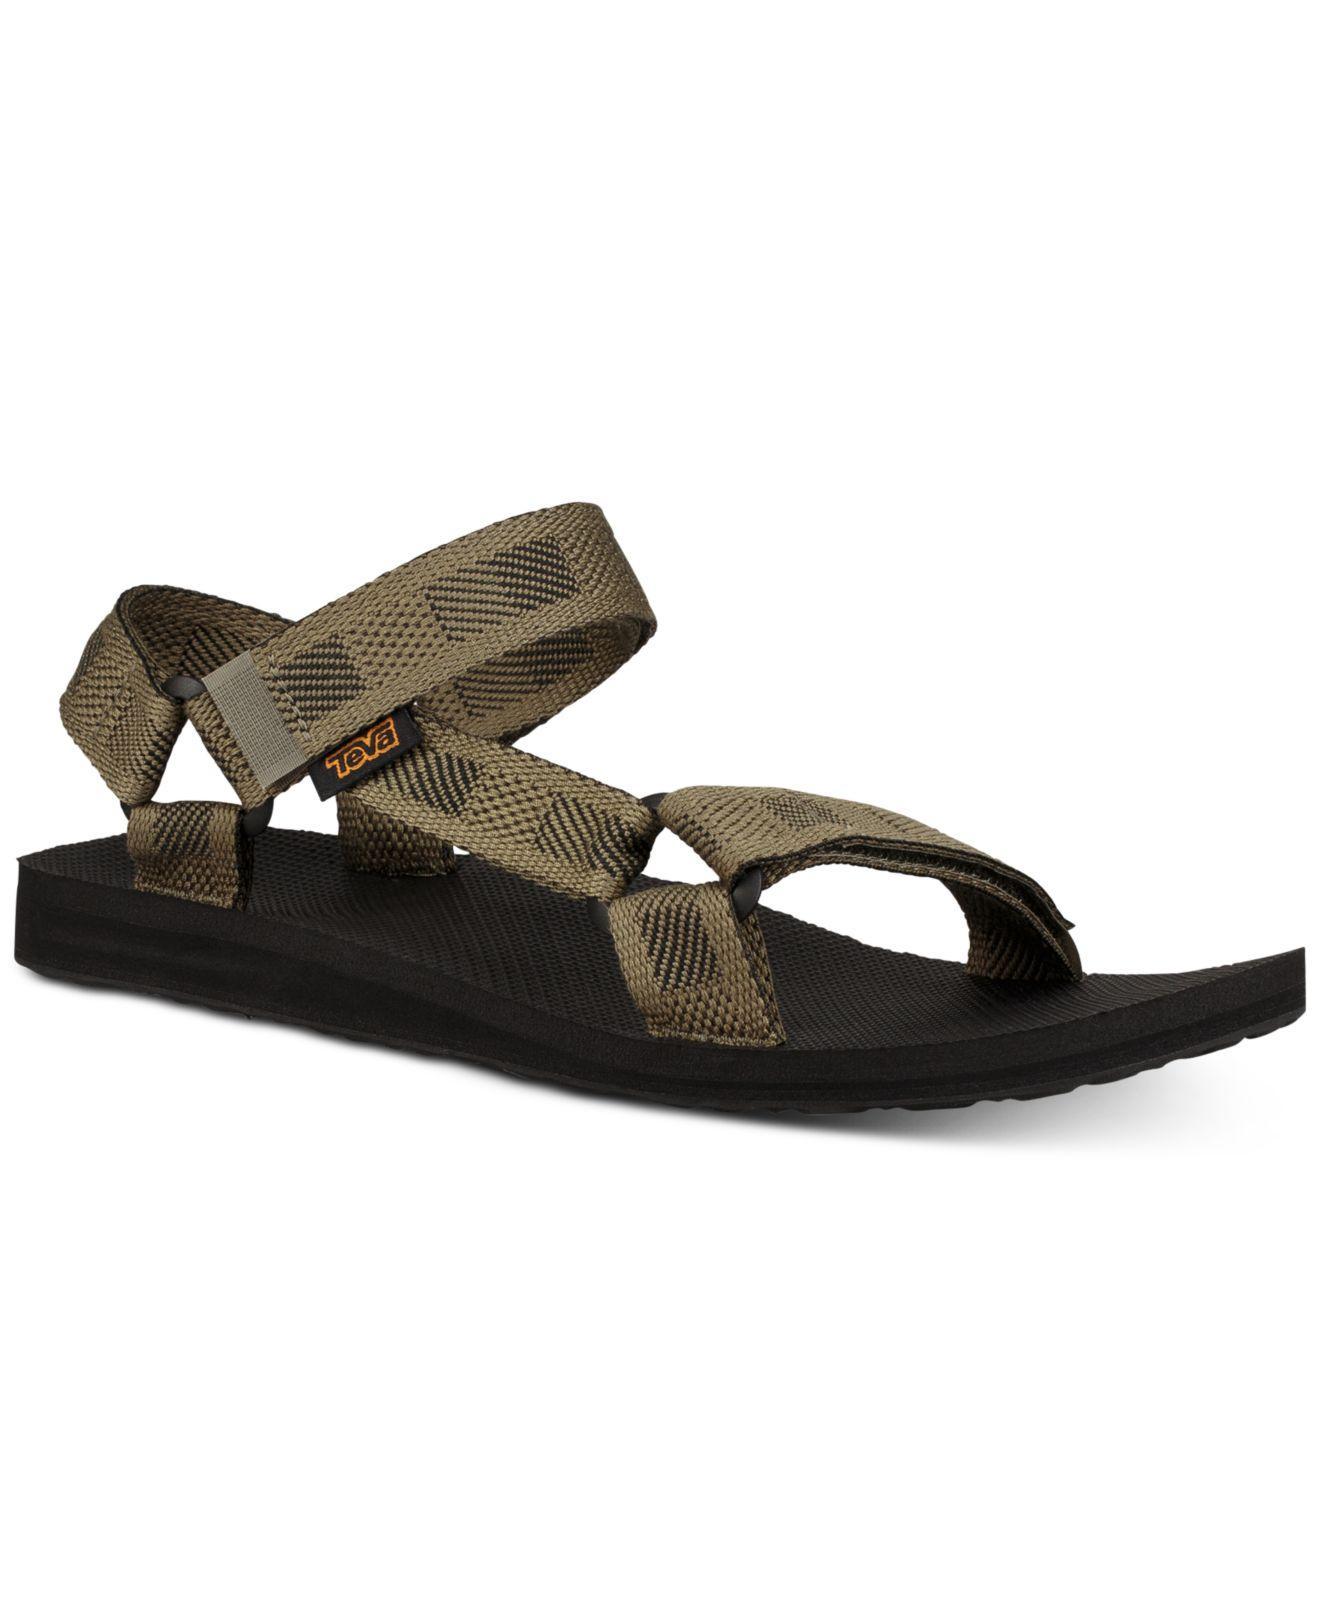 abcfa80dd Lyst - Teva Original Universe Sandals for Men